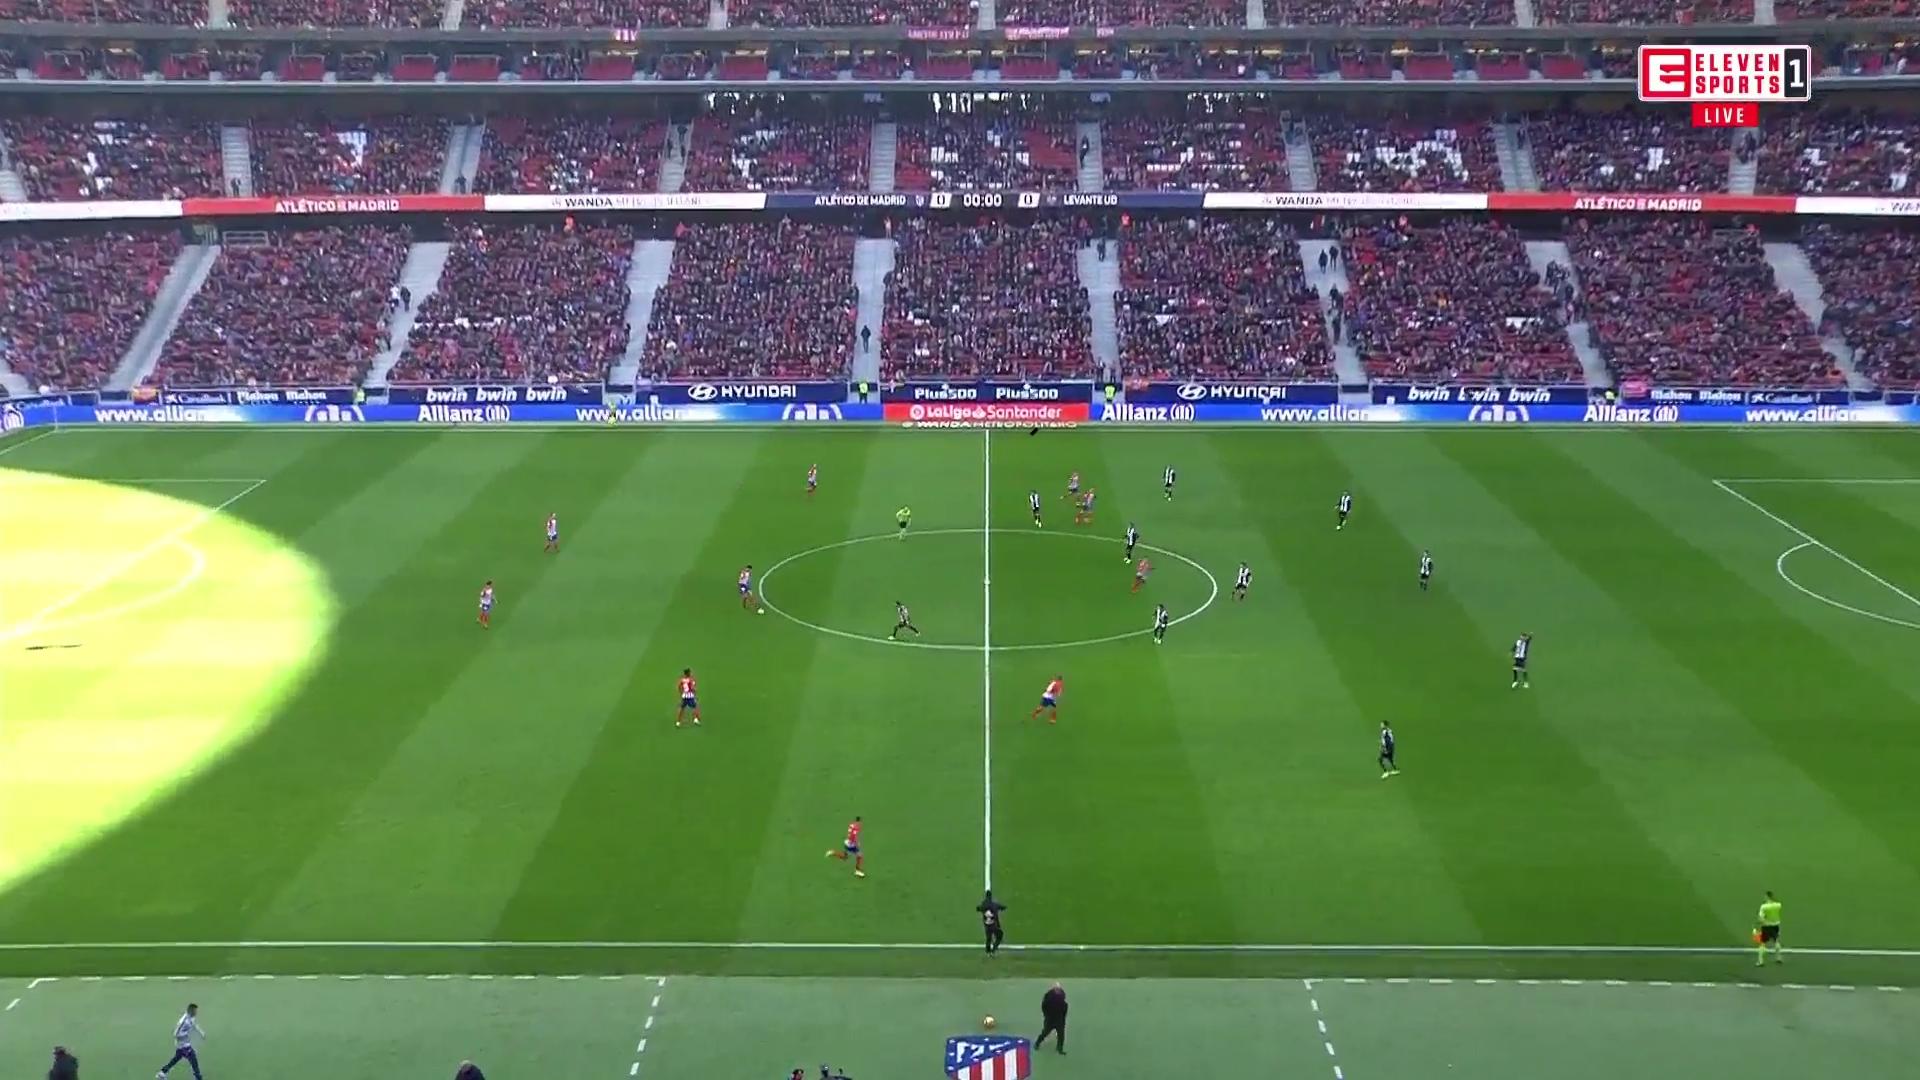 13-01-2019 - Atletico Madrid 1-0 Levante